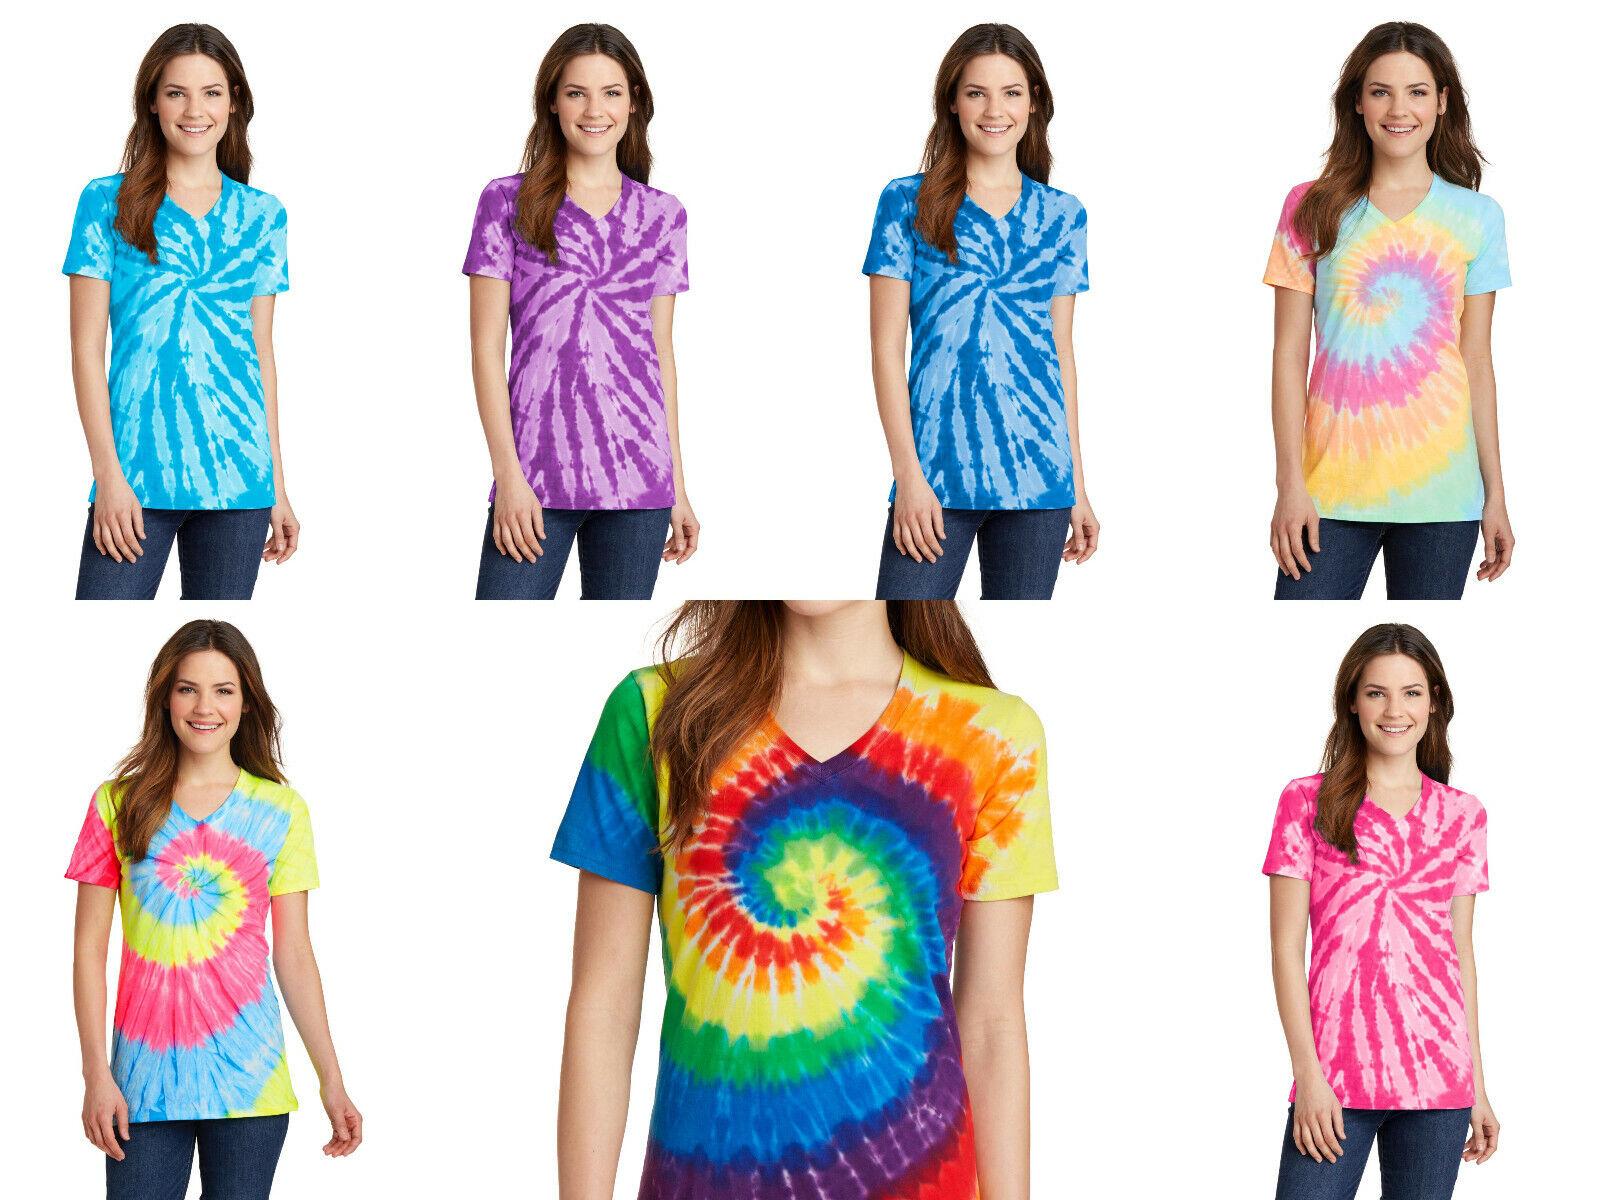 как выглядит New Ladies Tie-Dye Tee Tye Dyed V-Neck T-Shirt Spiral Womens XS-4XL Groovy фото